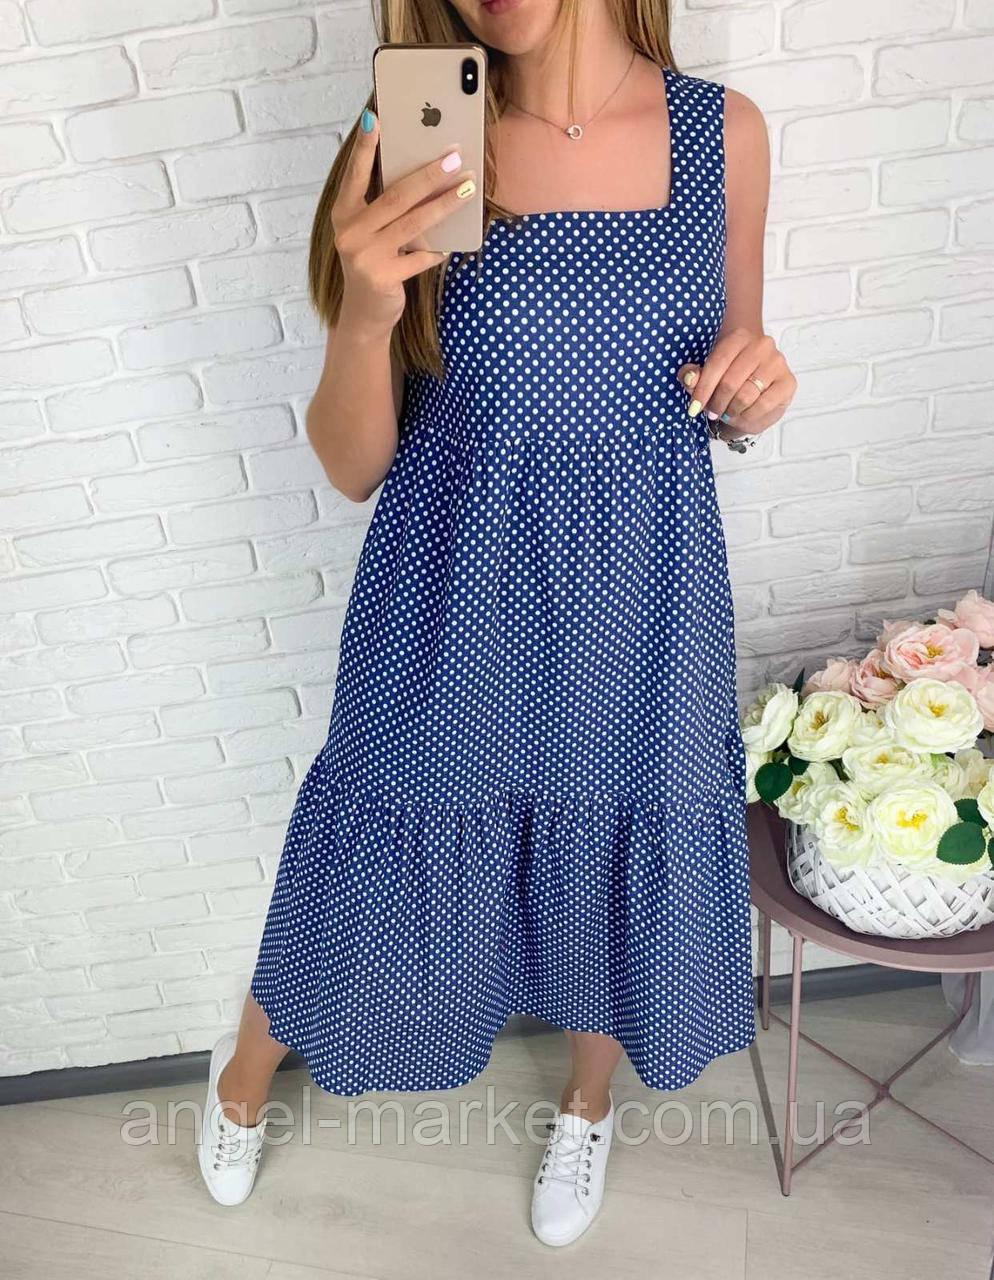 Летнее платье,платье летнее норма и батал.Новинка2020